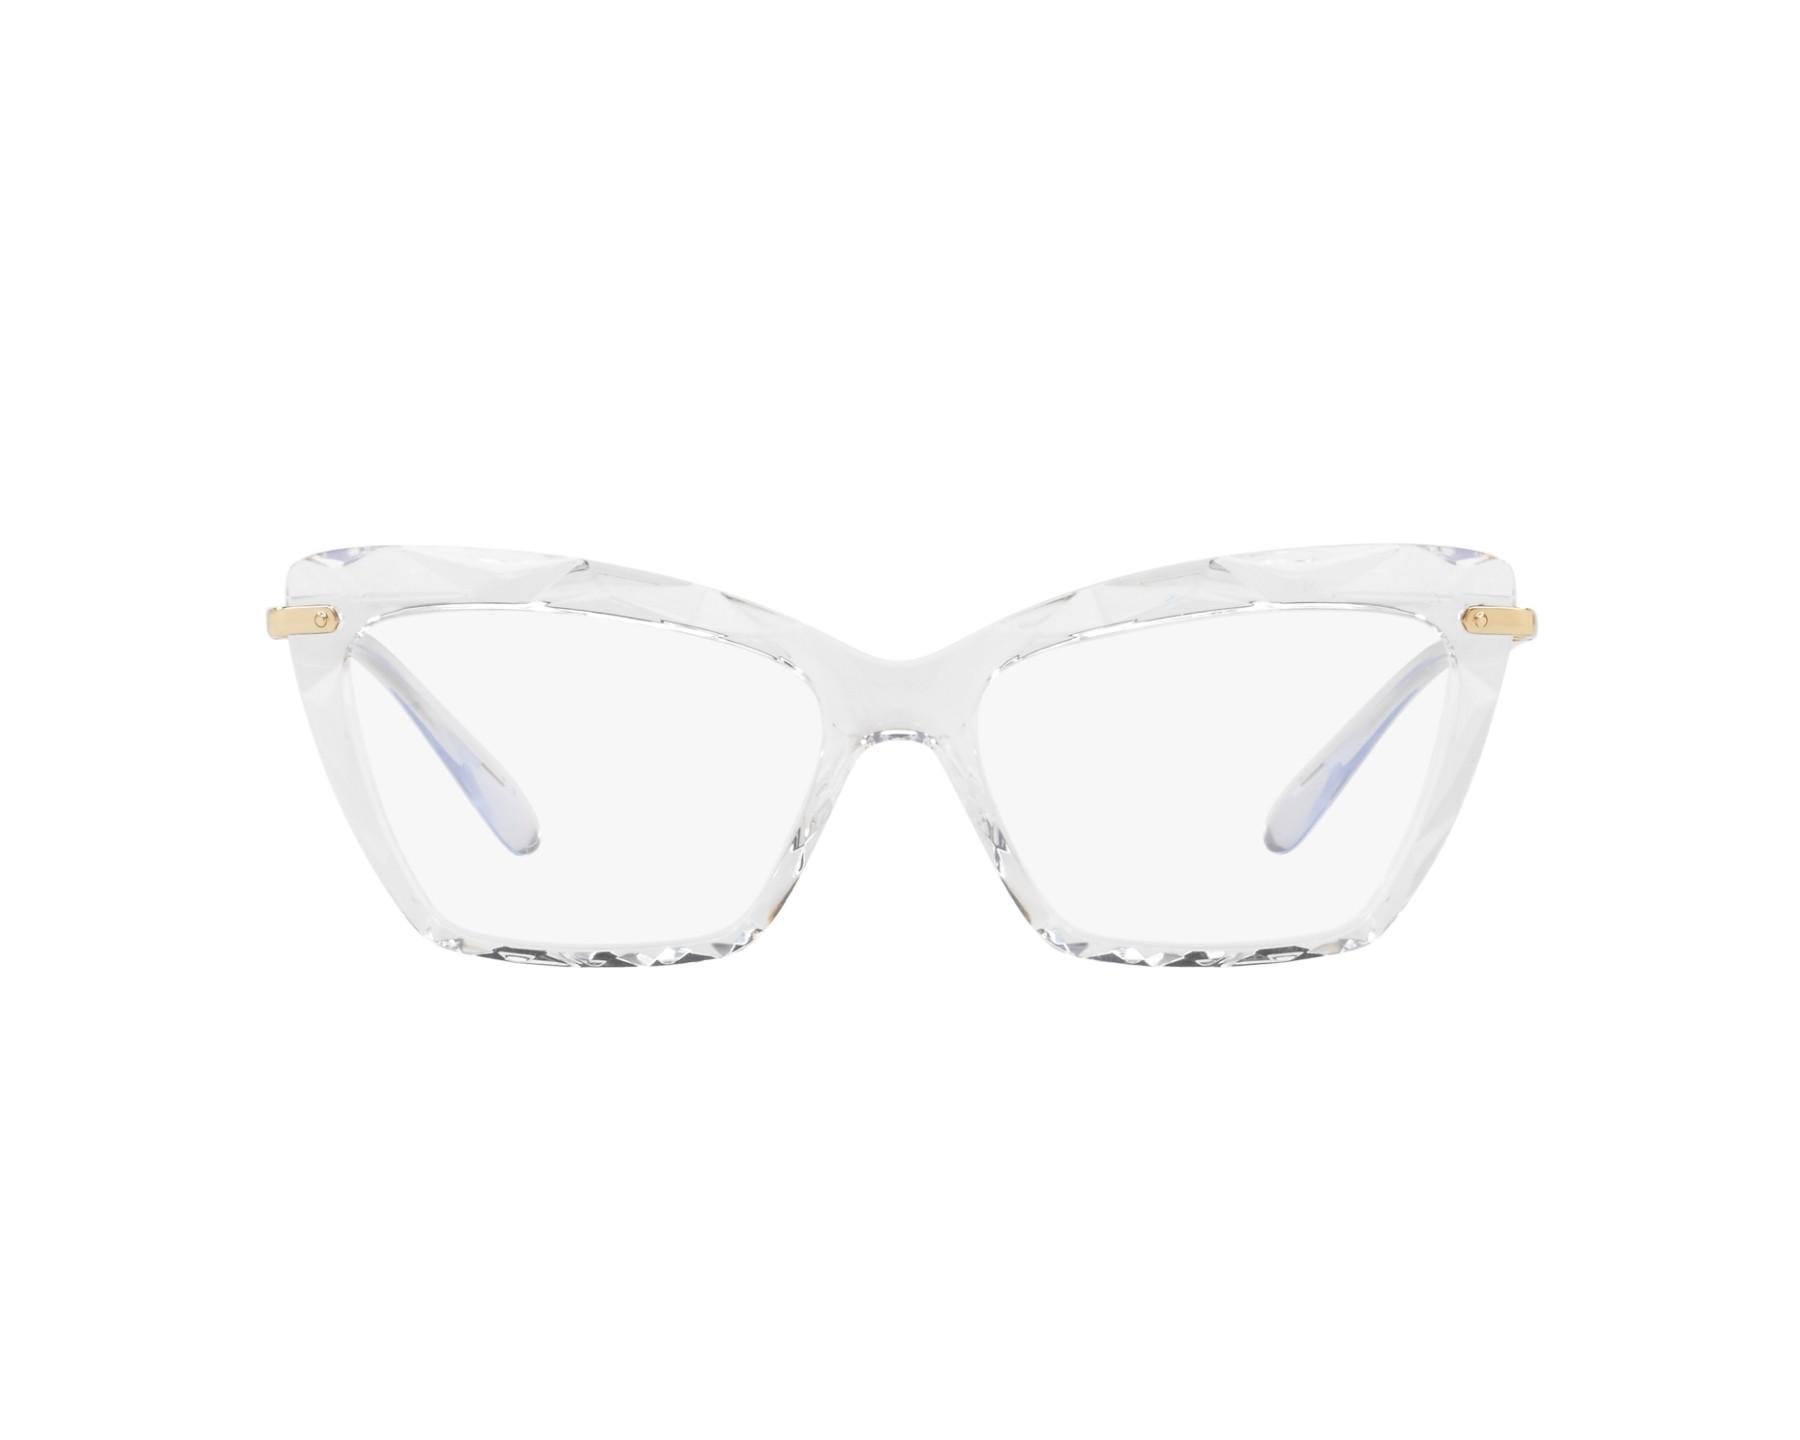 940b2aab52b eyeglasses Dolce   Gabbana DG-5025 3133 53-15 Crystal Gold 360 degree view